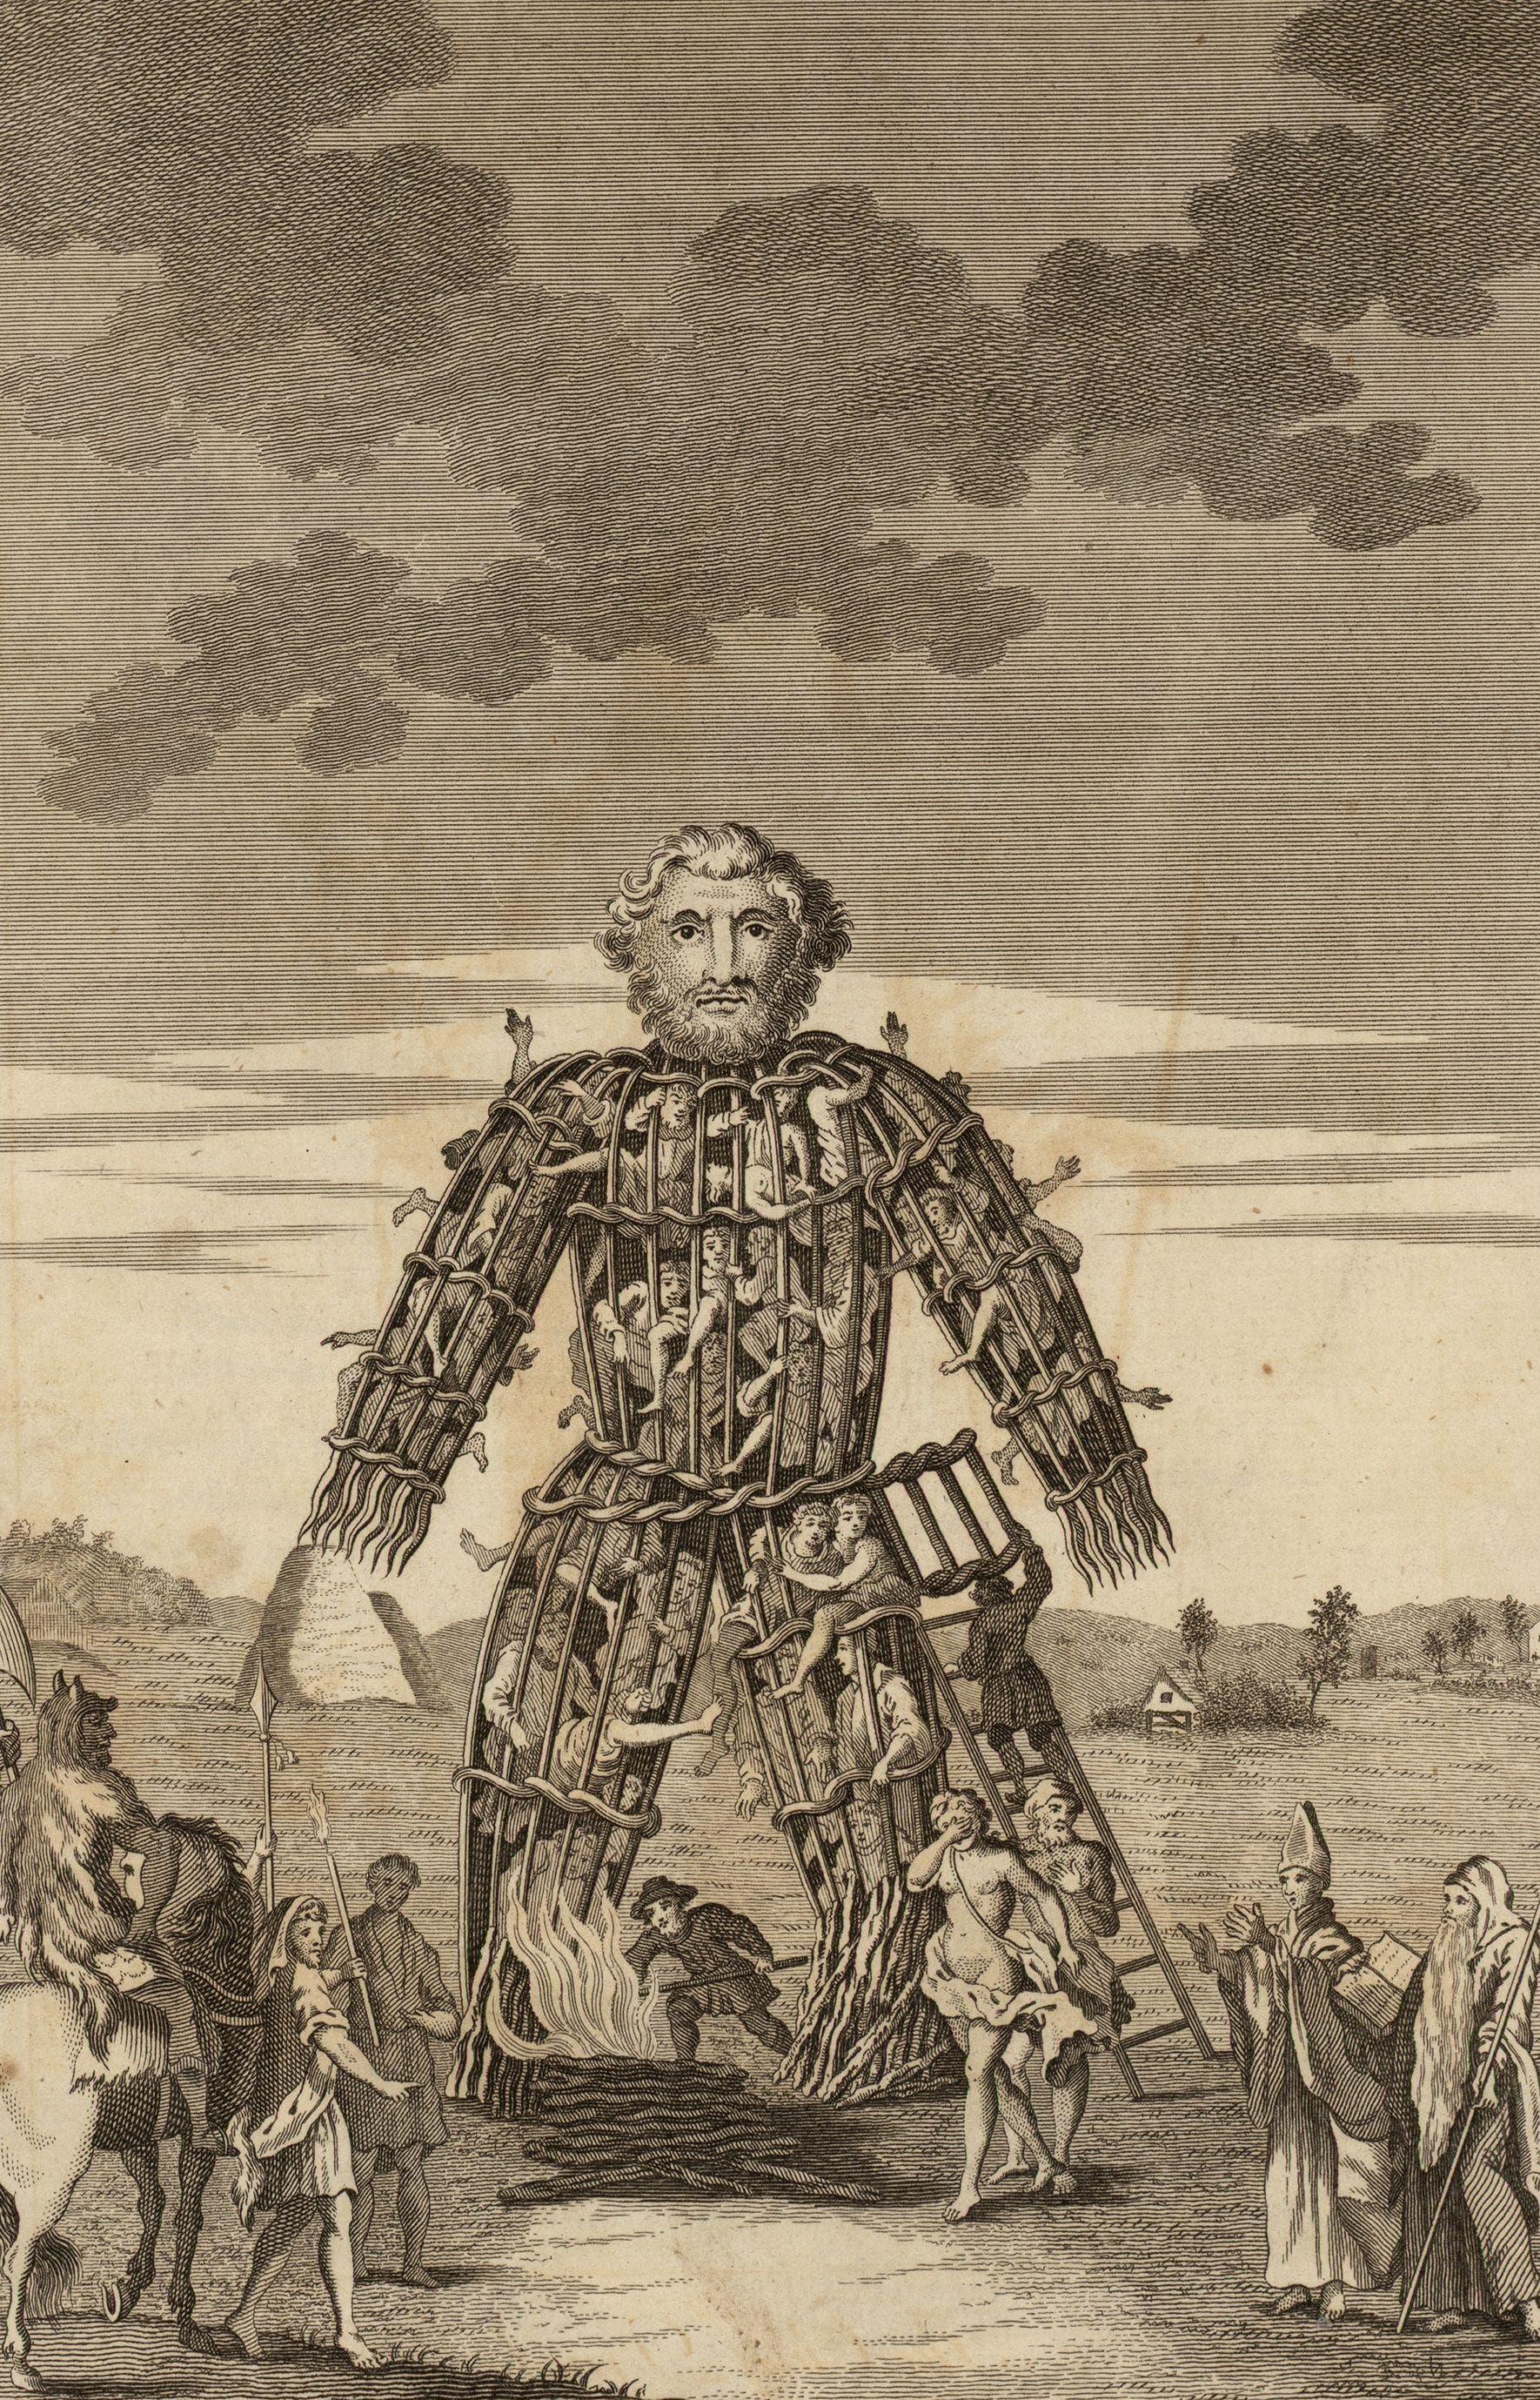 Random Brutal Human Sacrifice Practices Throughout History